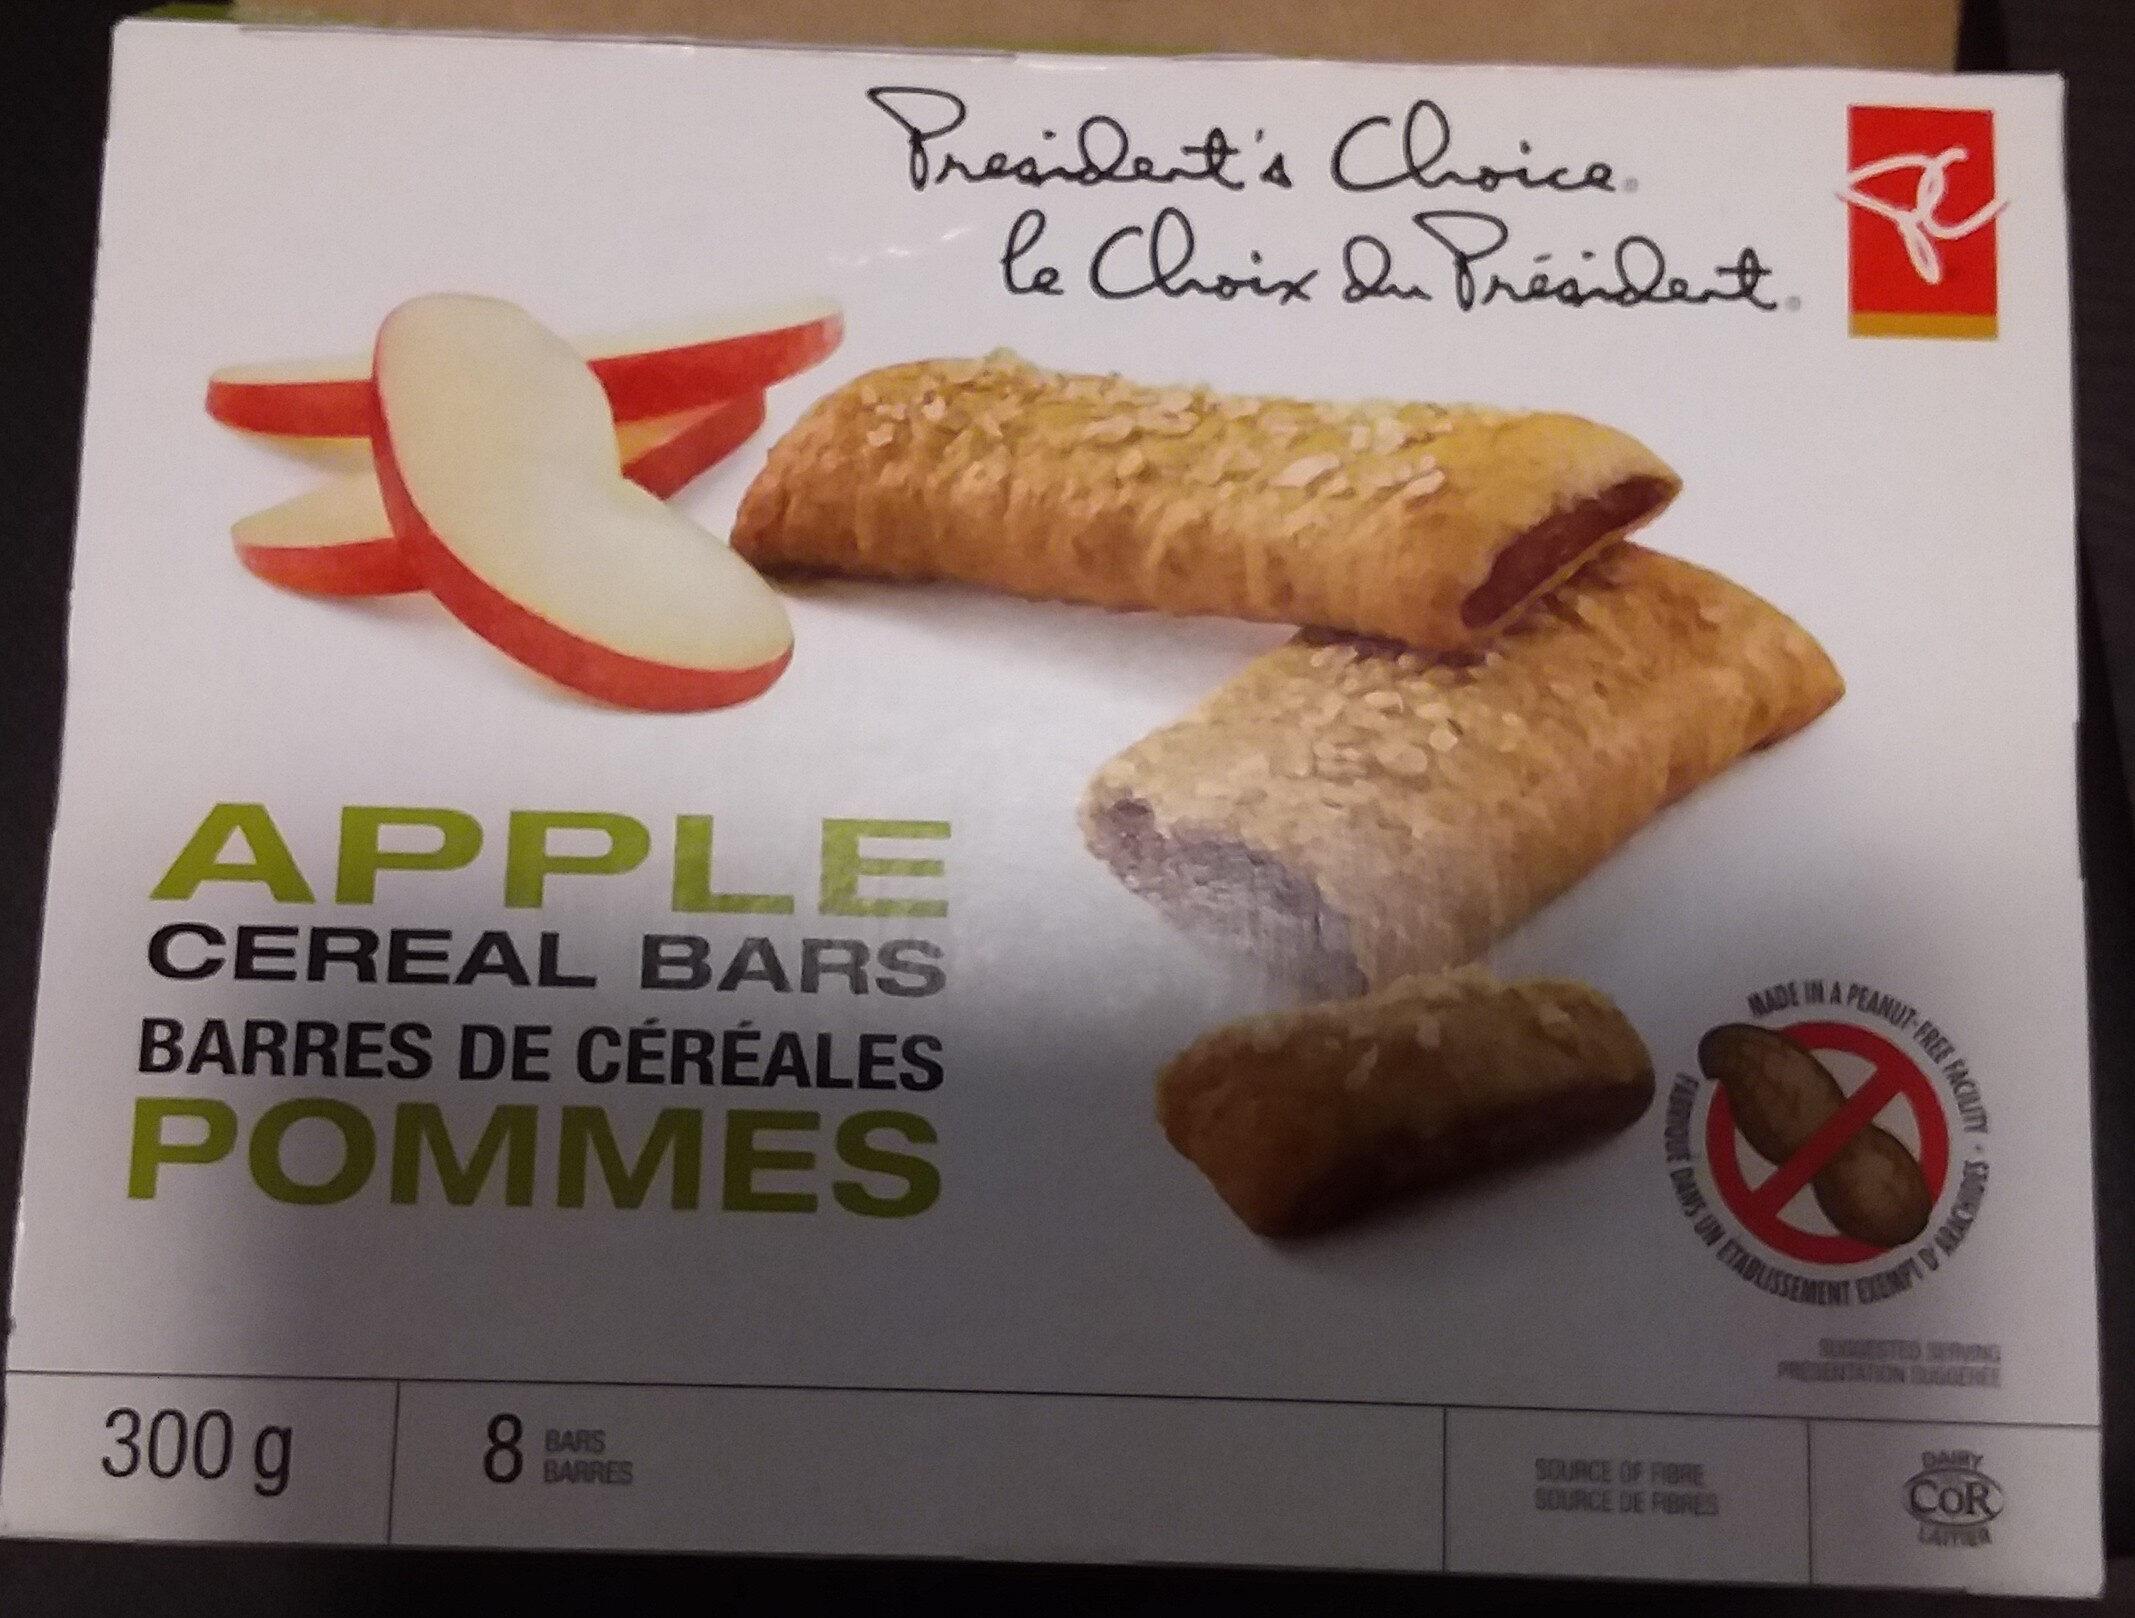 Apple cereal bars - Product - en